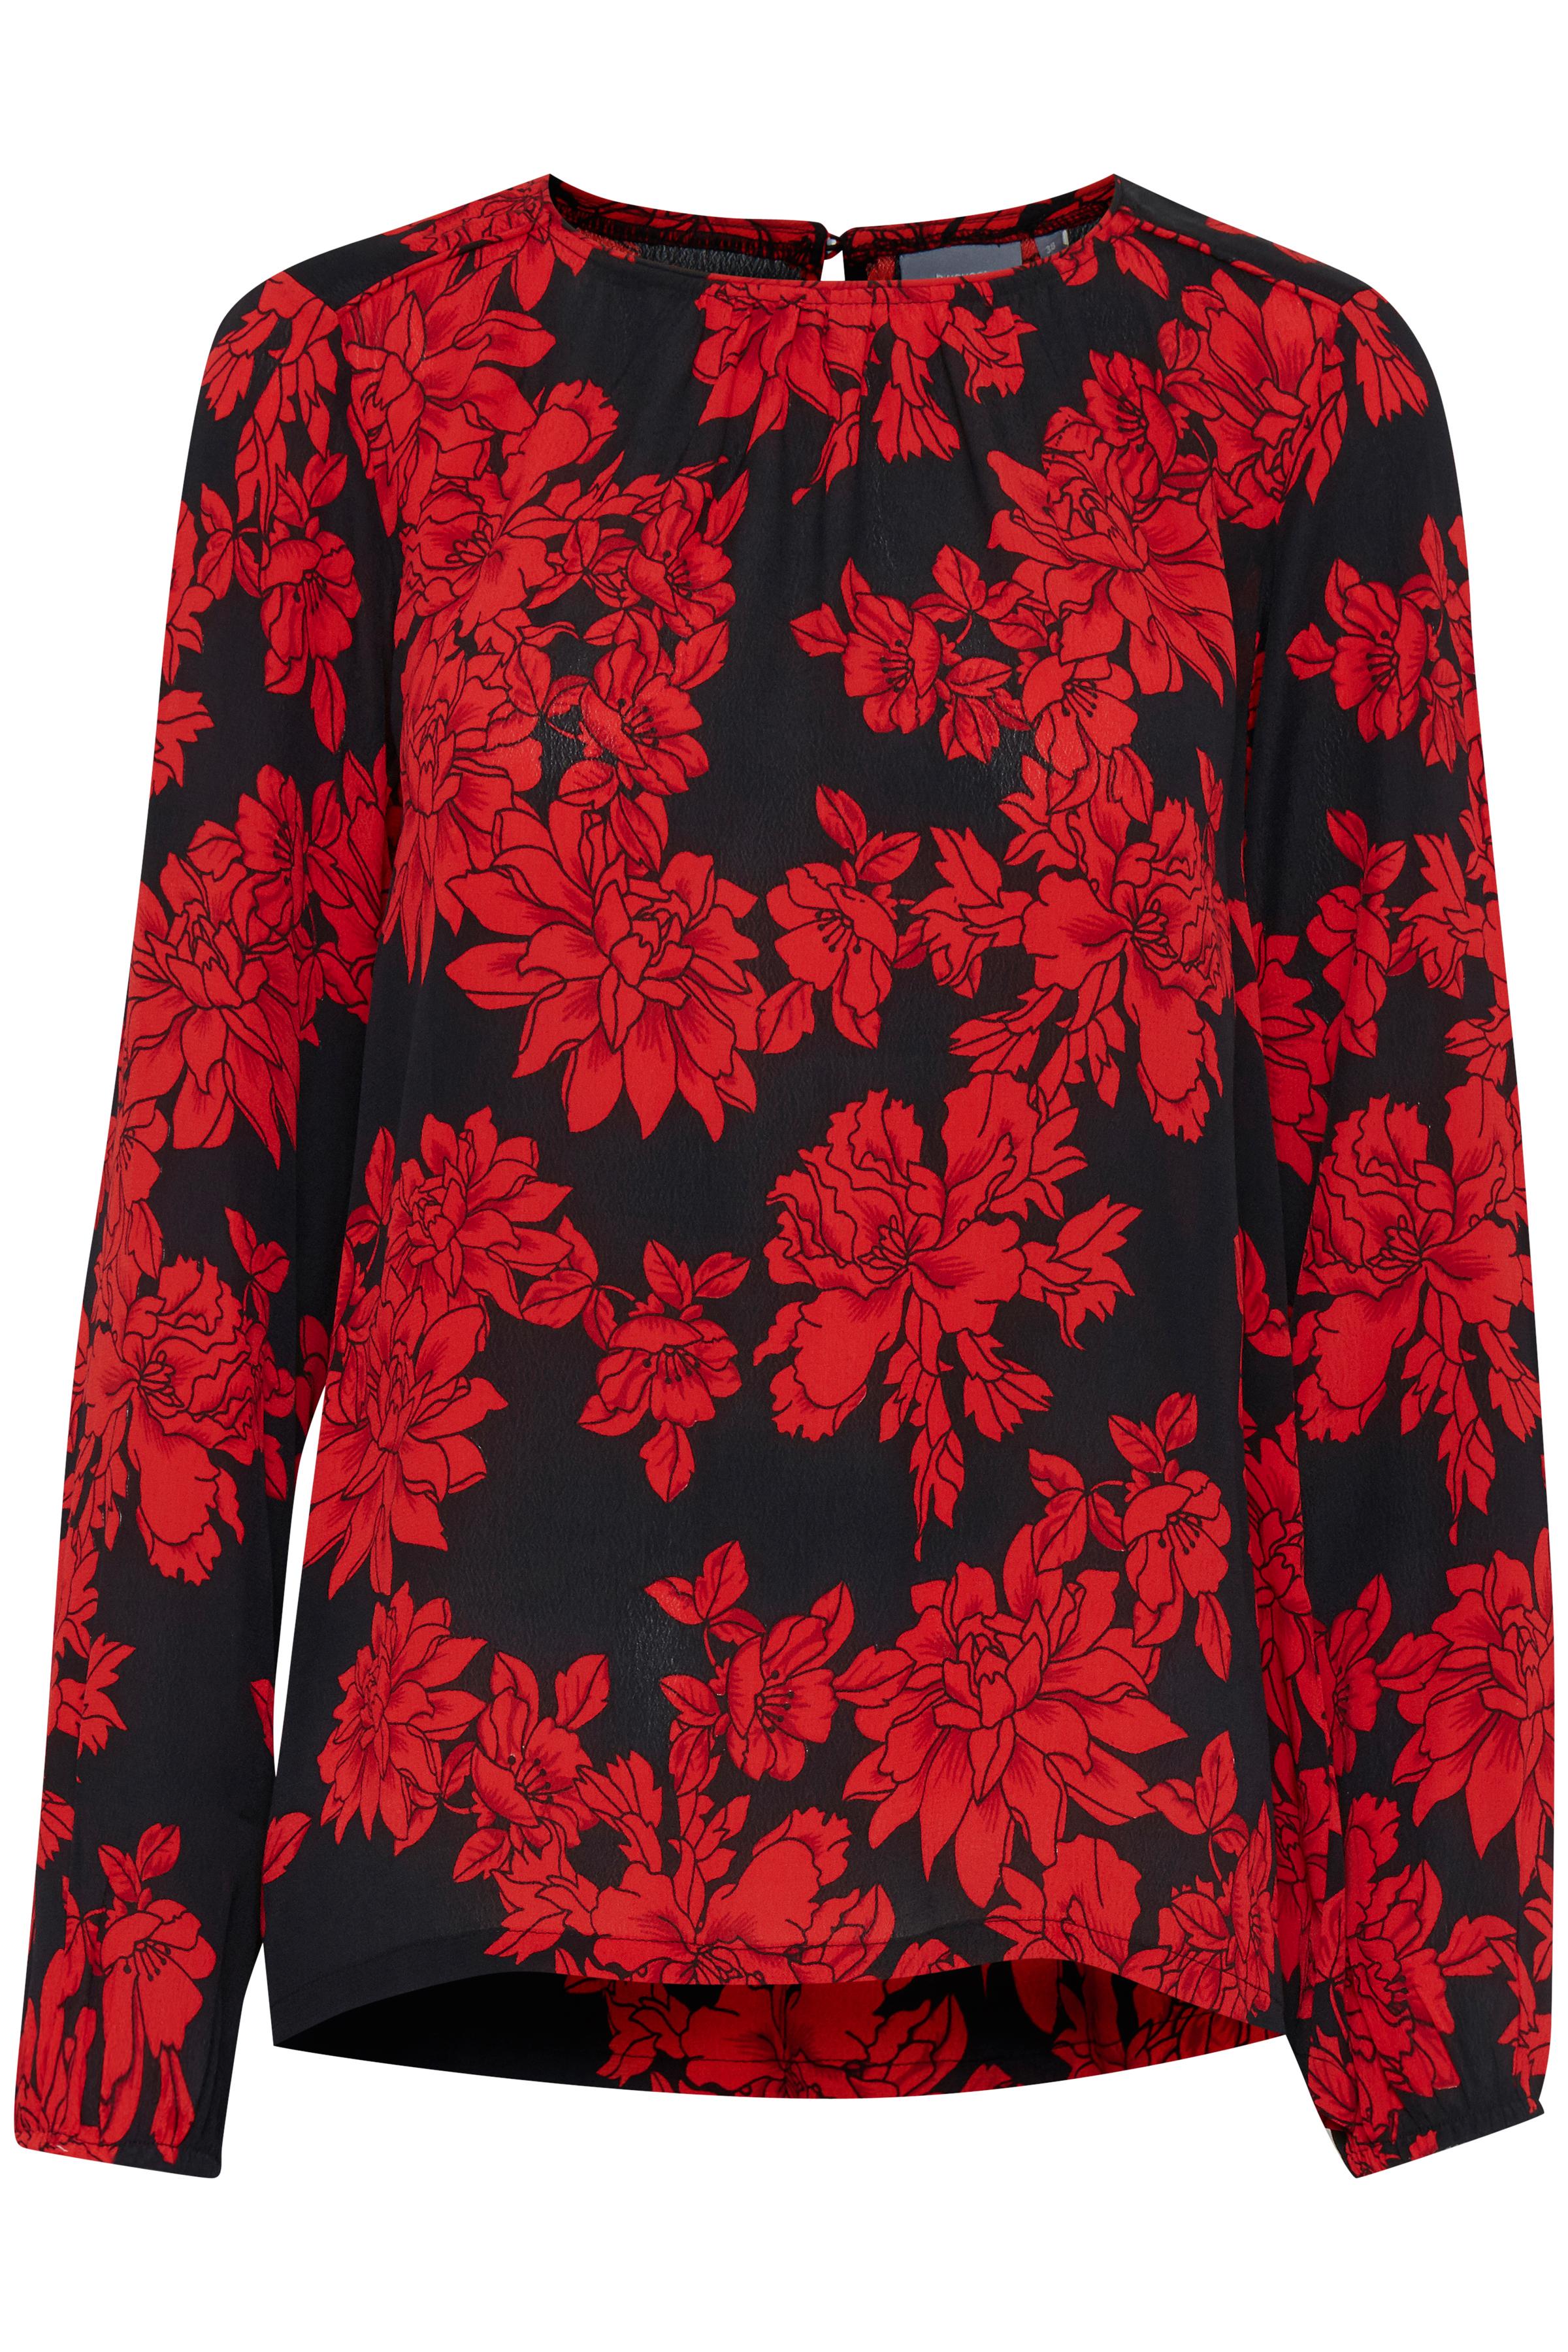 Black w. red flowers Långärmad blus från b.young – Köp Black w. red flowers Långärmad blus från storlek 36-46 här